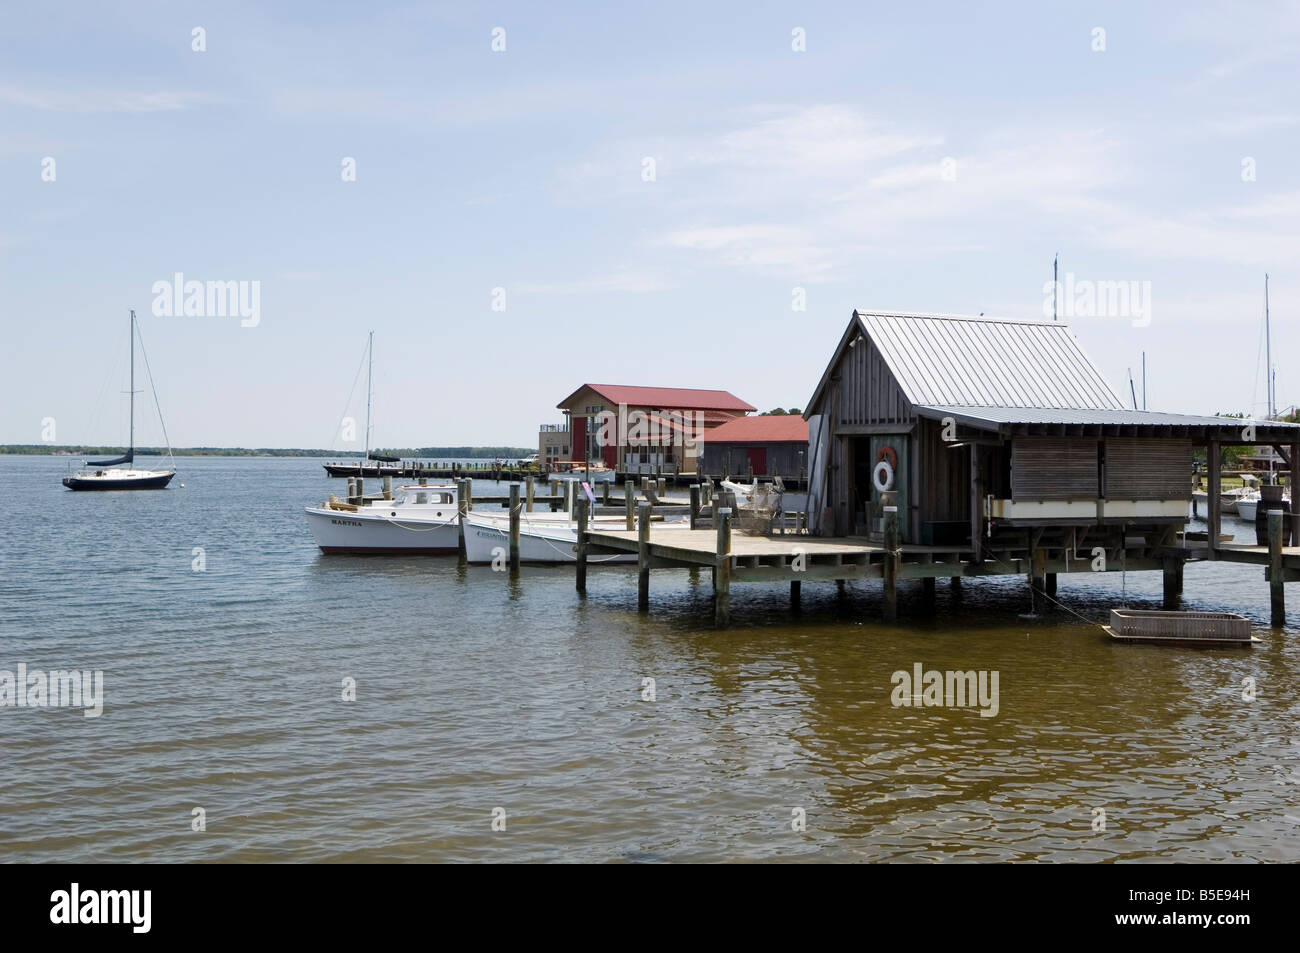 St. Michaels, Miles River, Chesapeake Bay area, Maryland, USA, North America - Stock Image